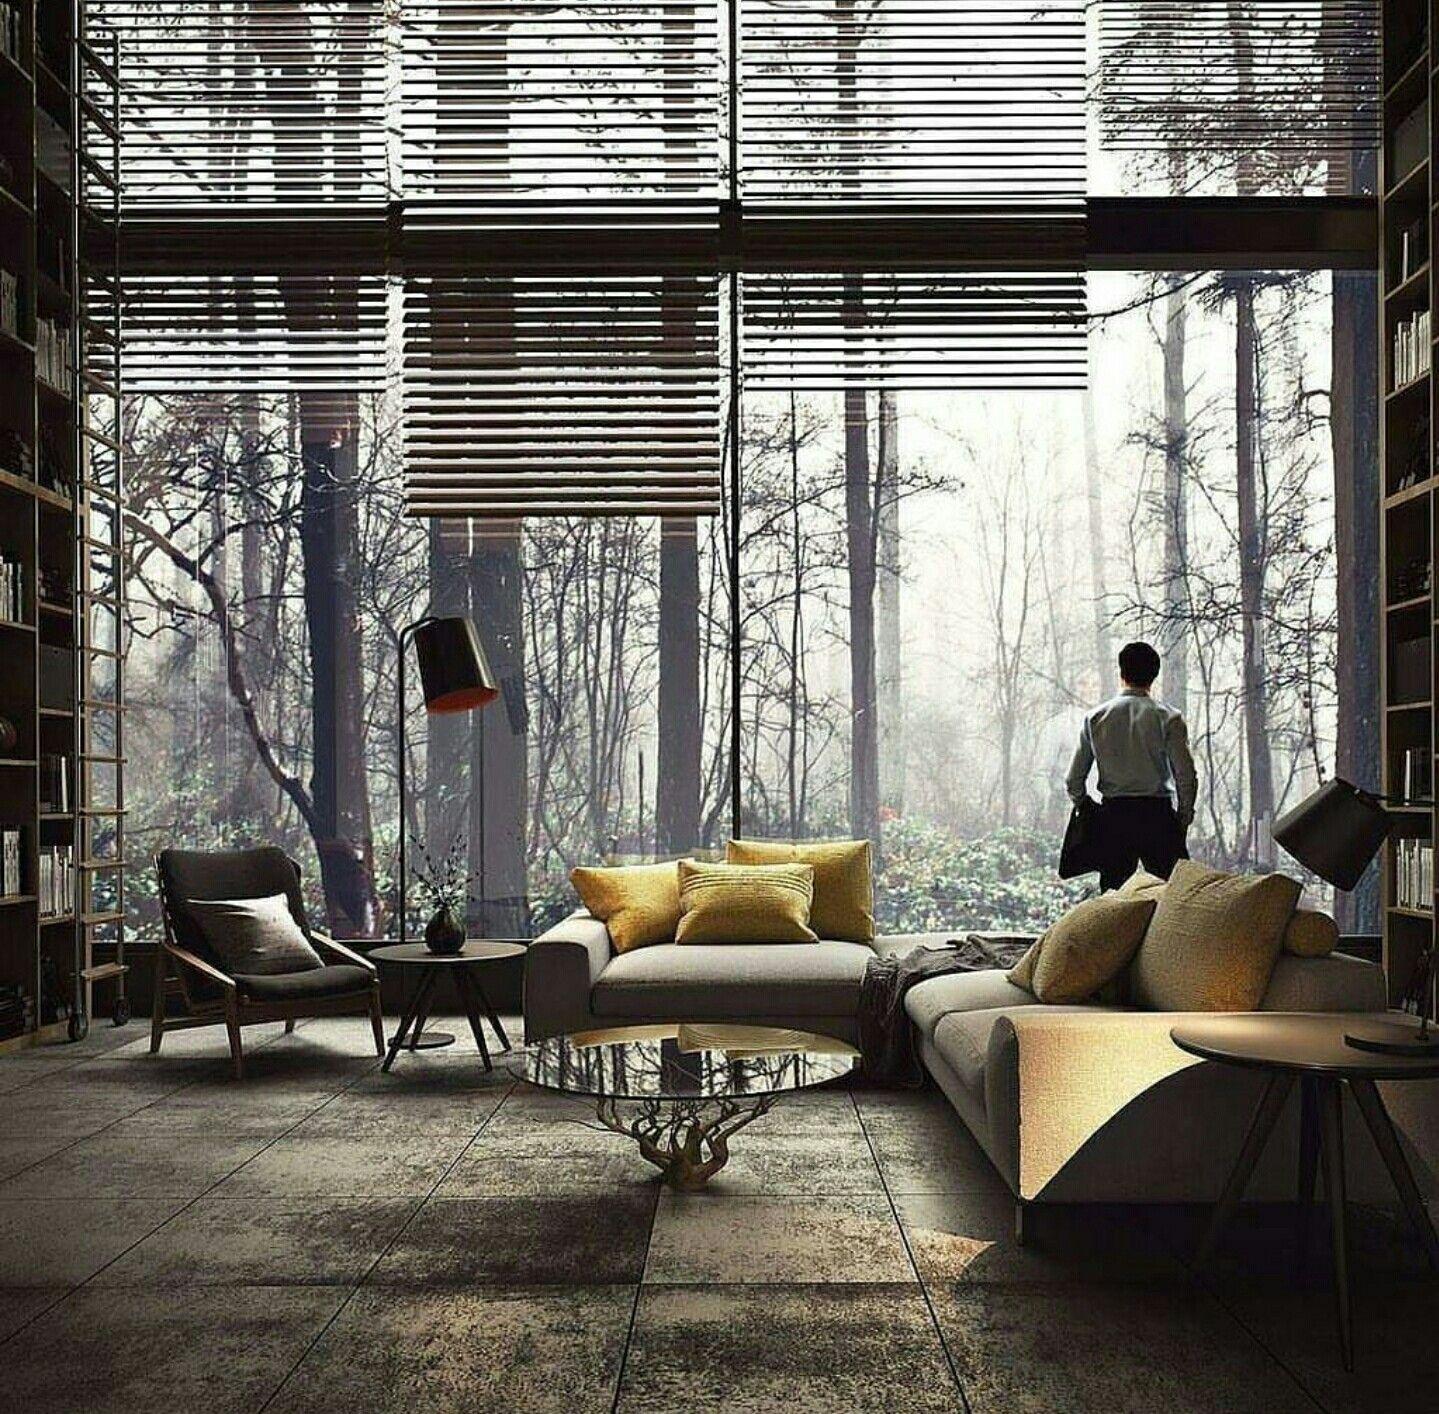 Interior Designed Living Rooms Impressive Pinstefan Wessel On Design  Pinterest  Lofts And Interiors Design Ideas